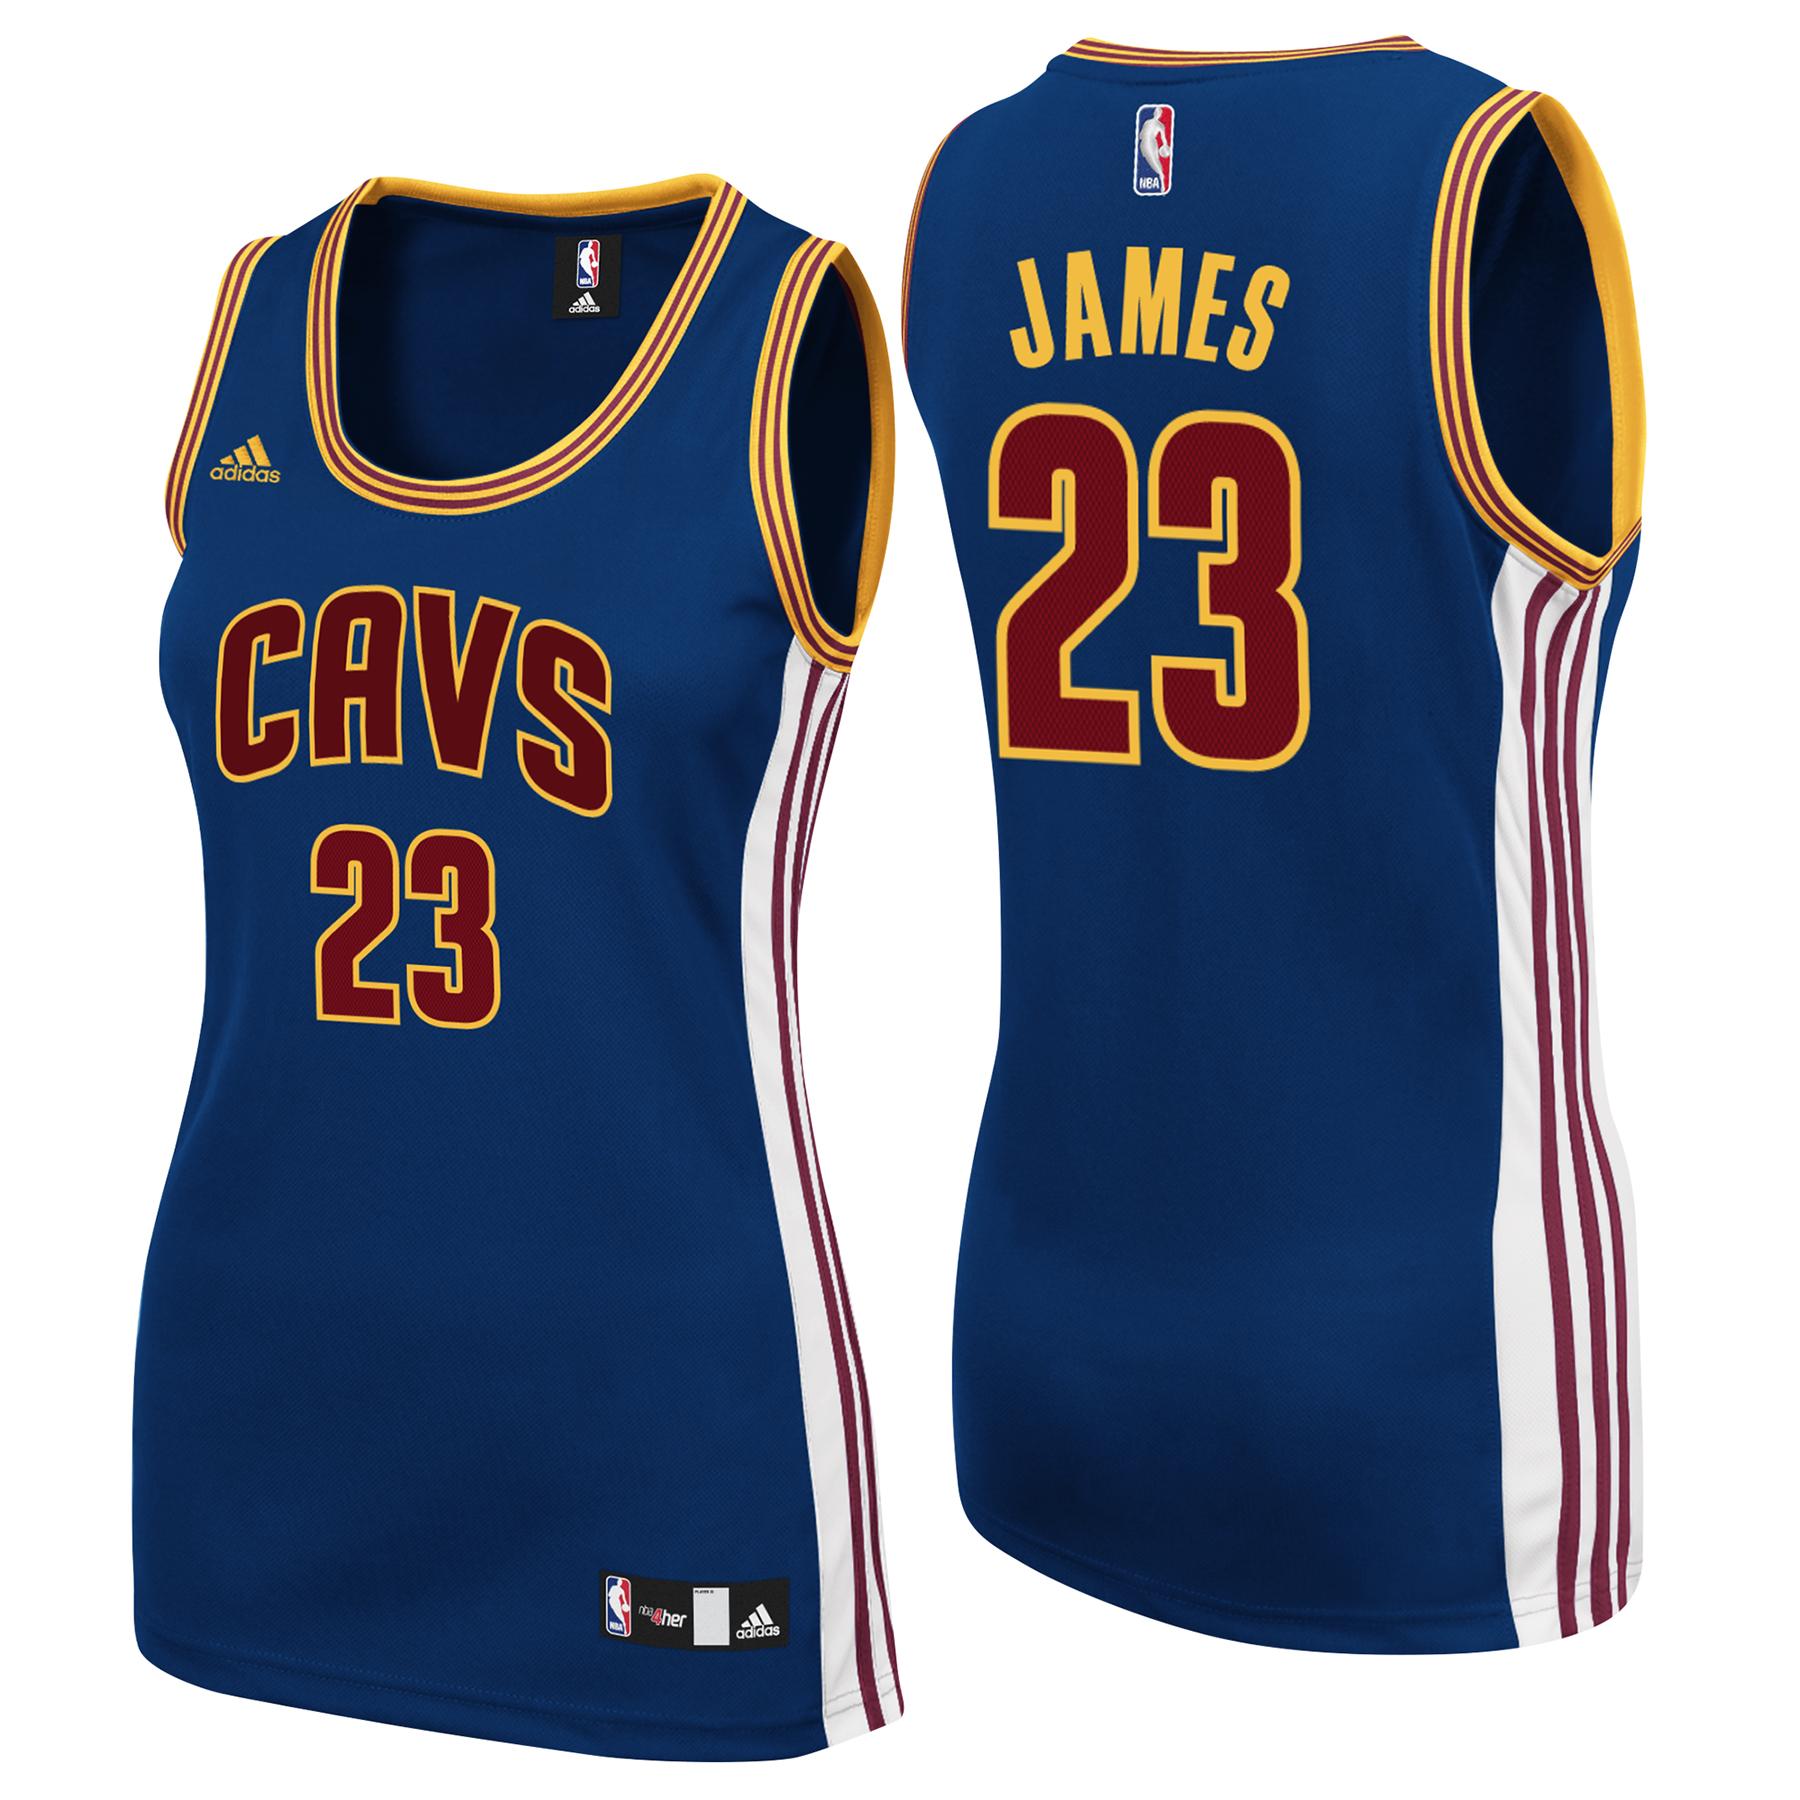 Cleveland Cavaliers Secondary Alternate Replica Jersey - Lebron James